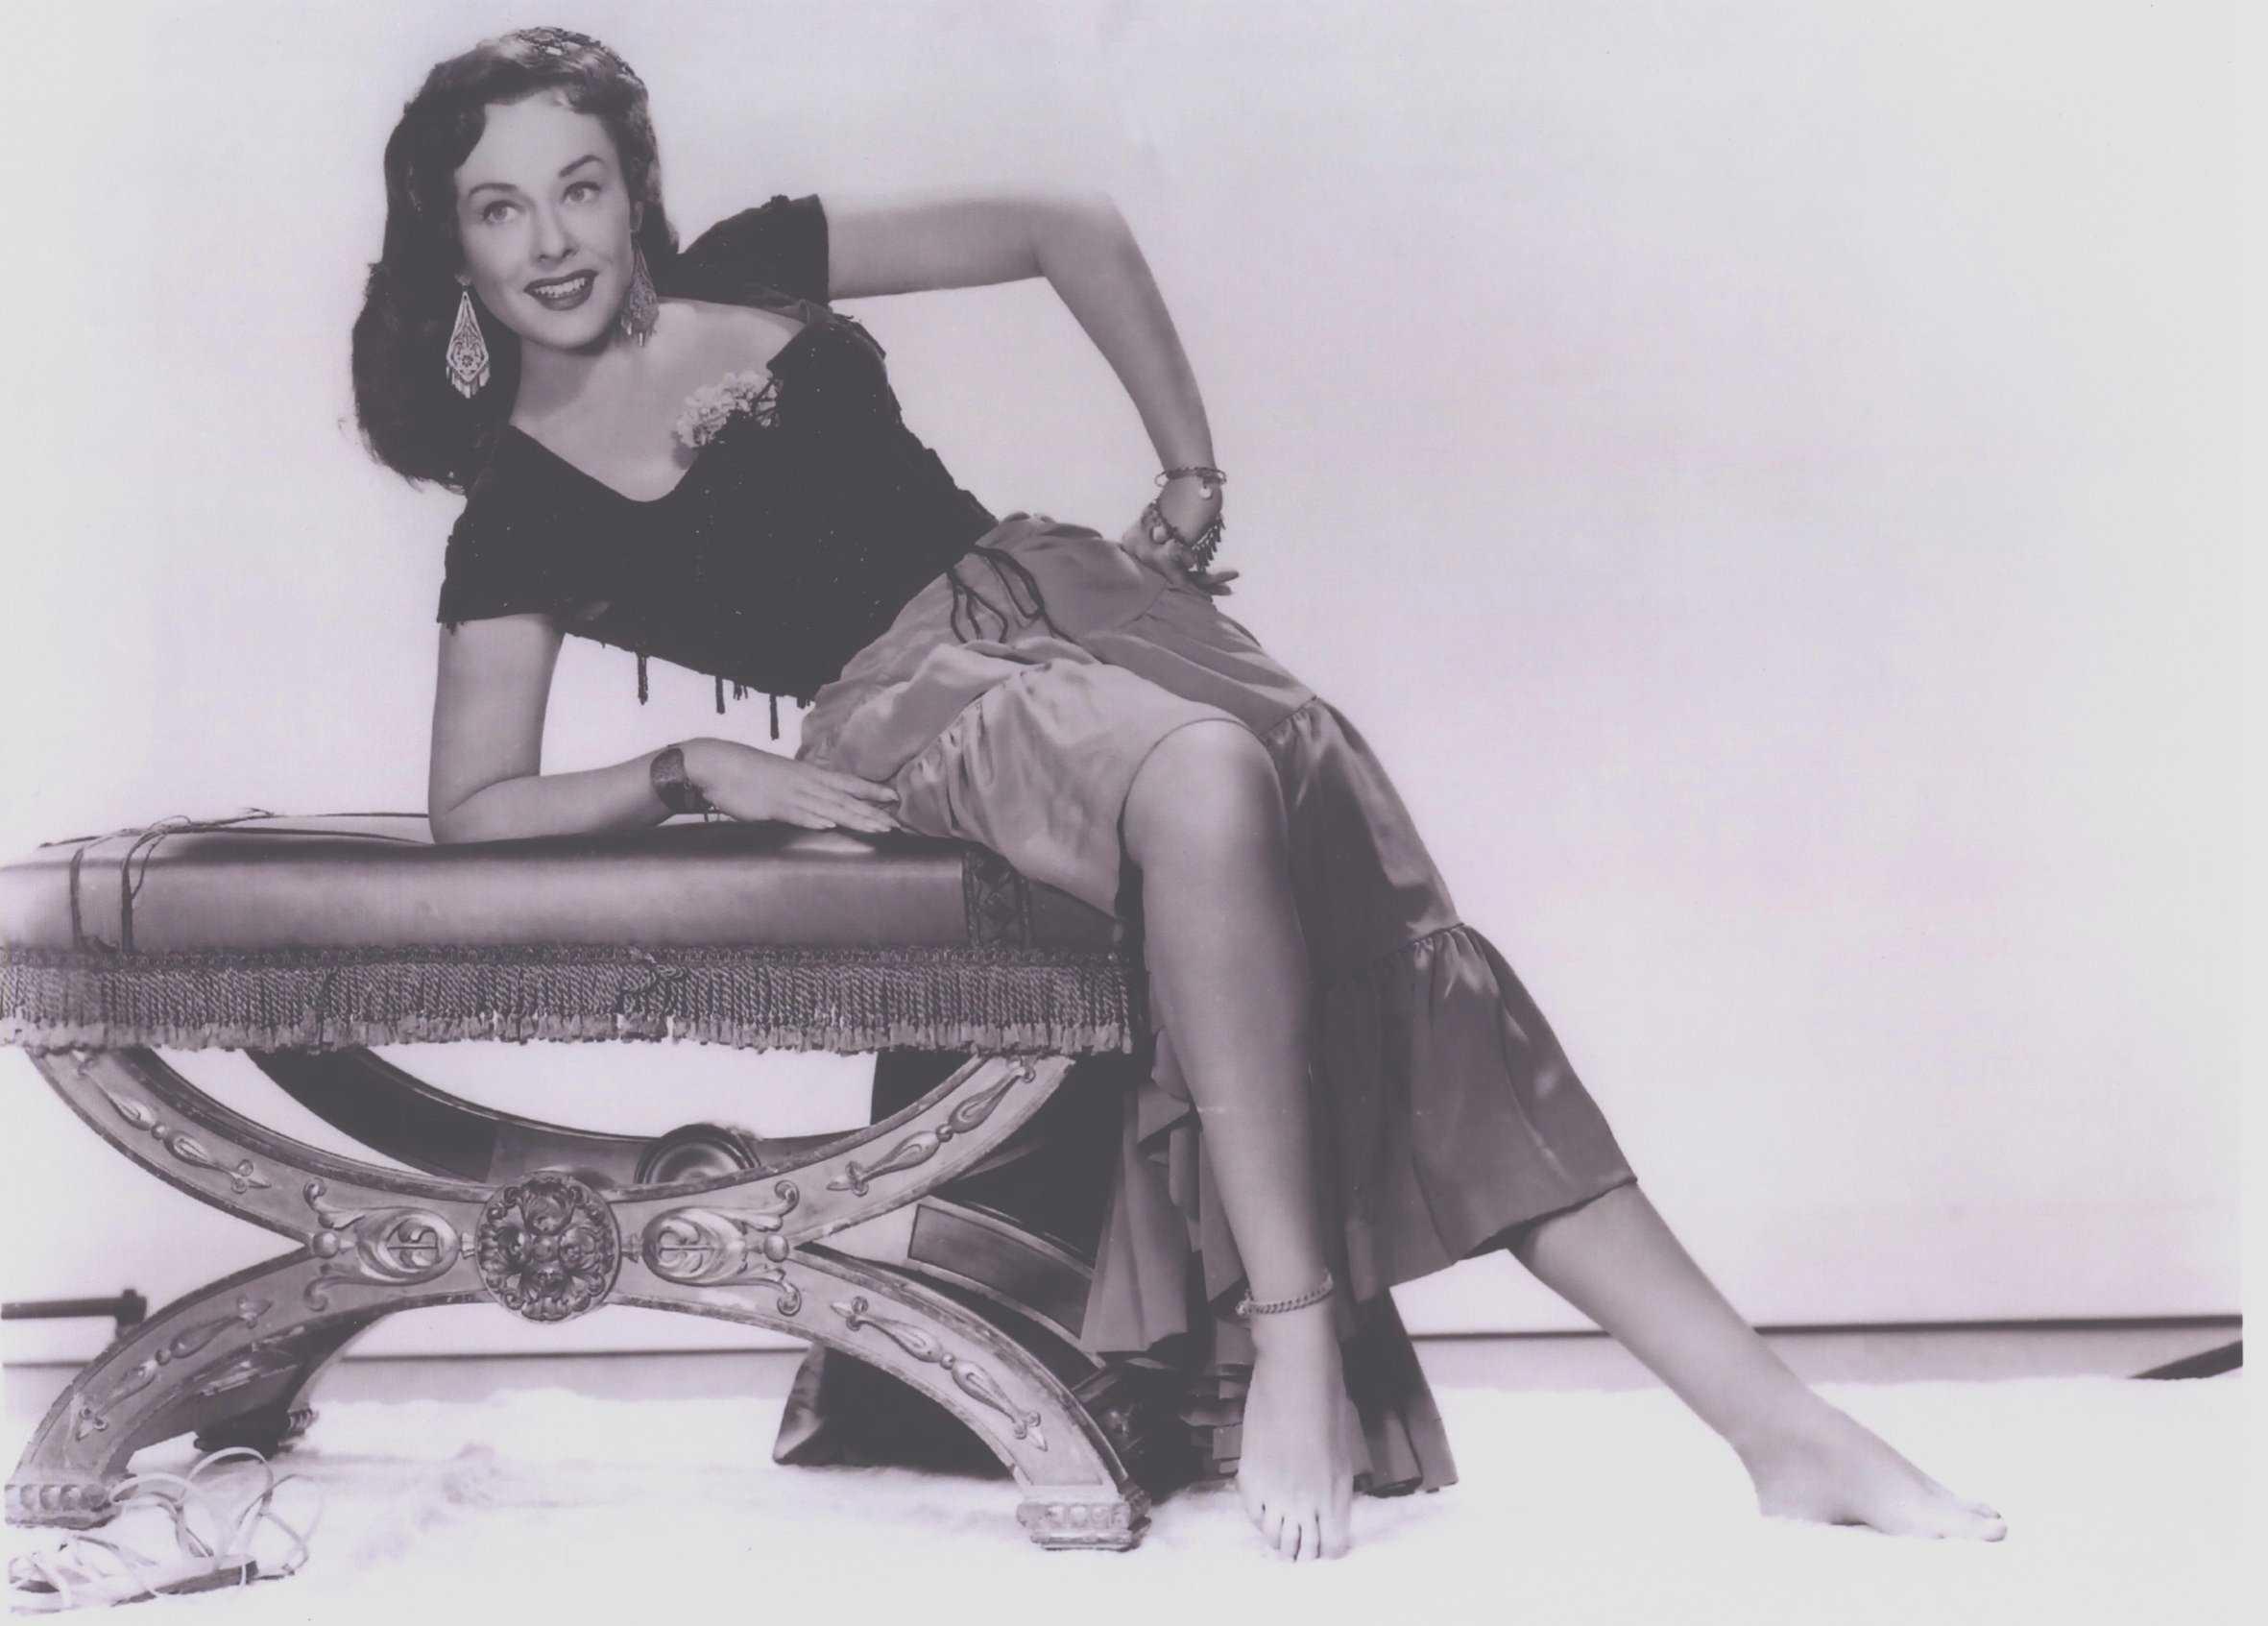 Paulette Goddard adorable